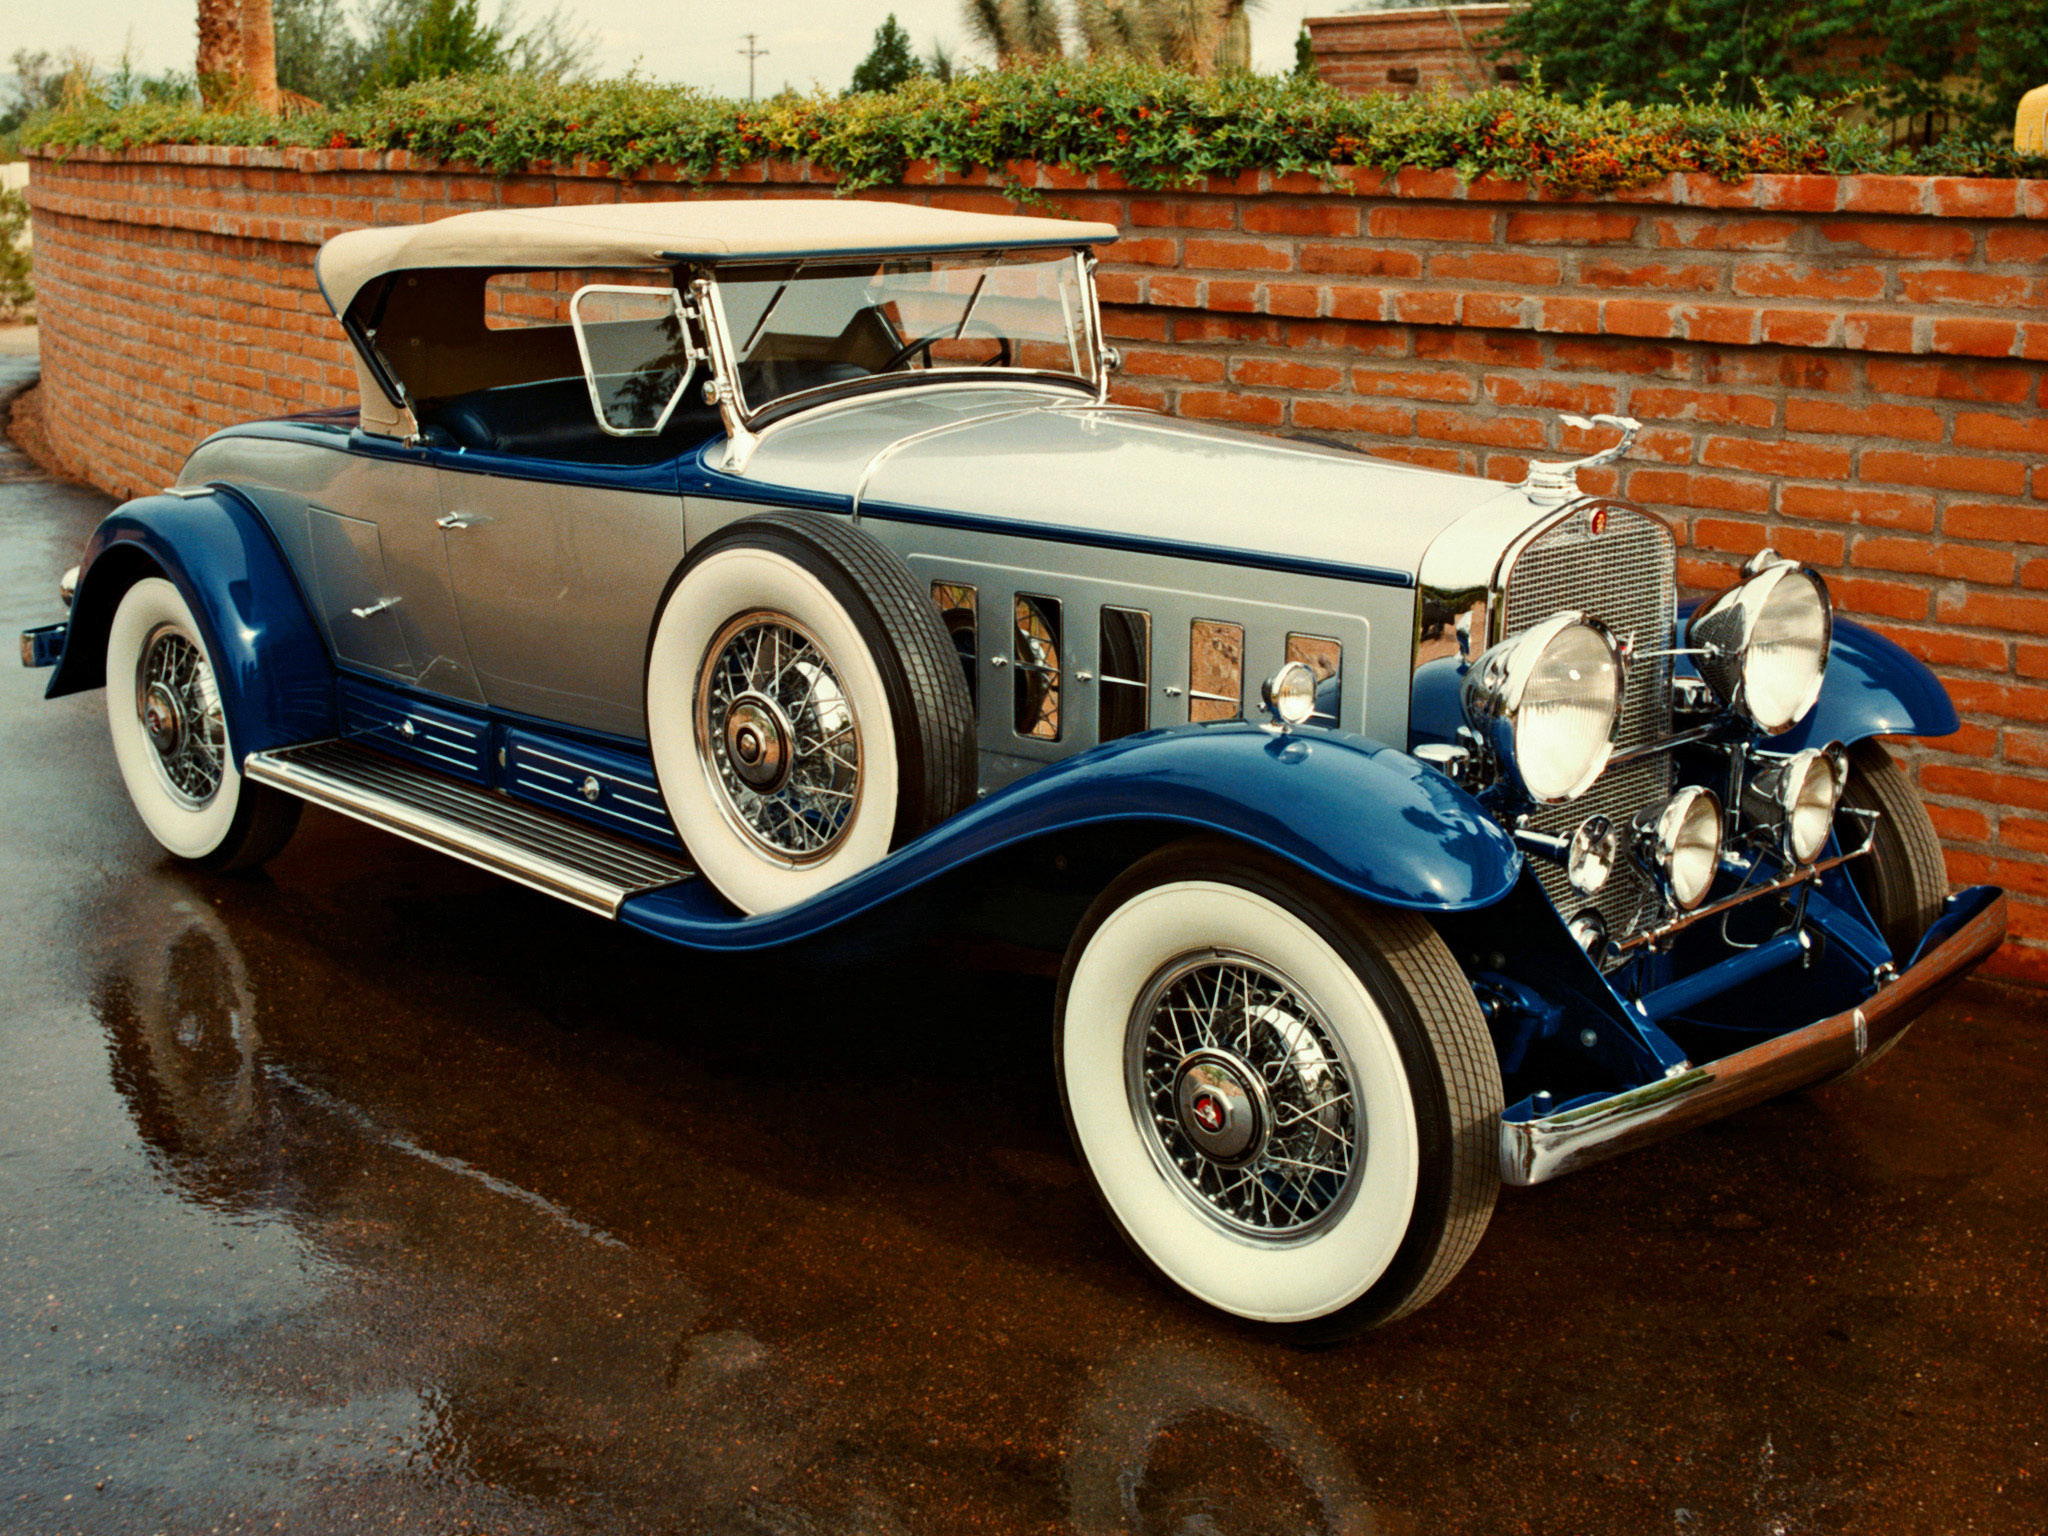 1930 Cadillac Model 452 V16 Pics, Vehicles Collection